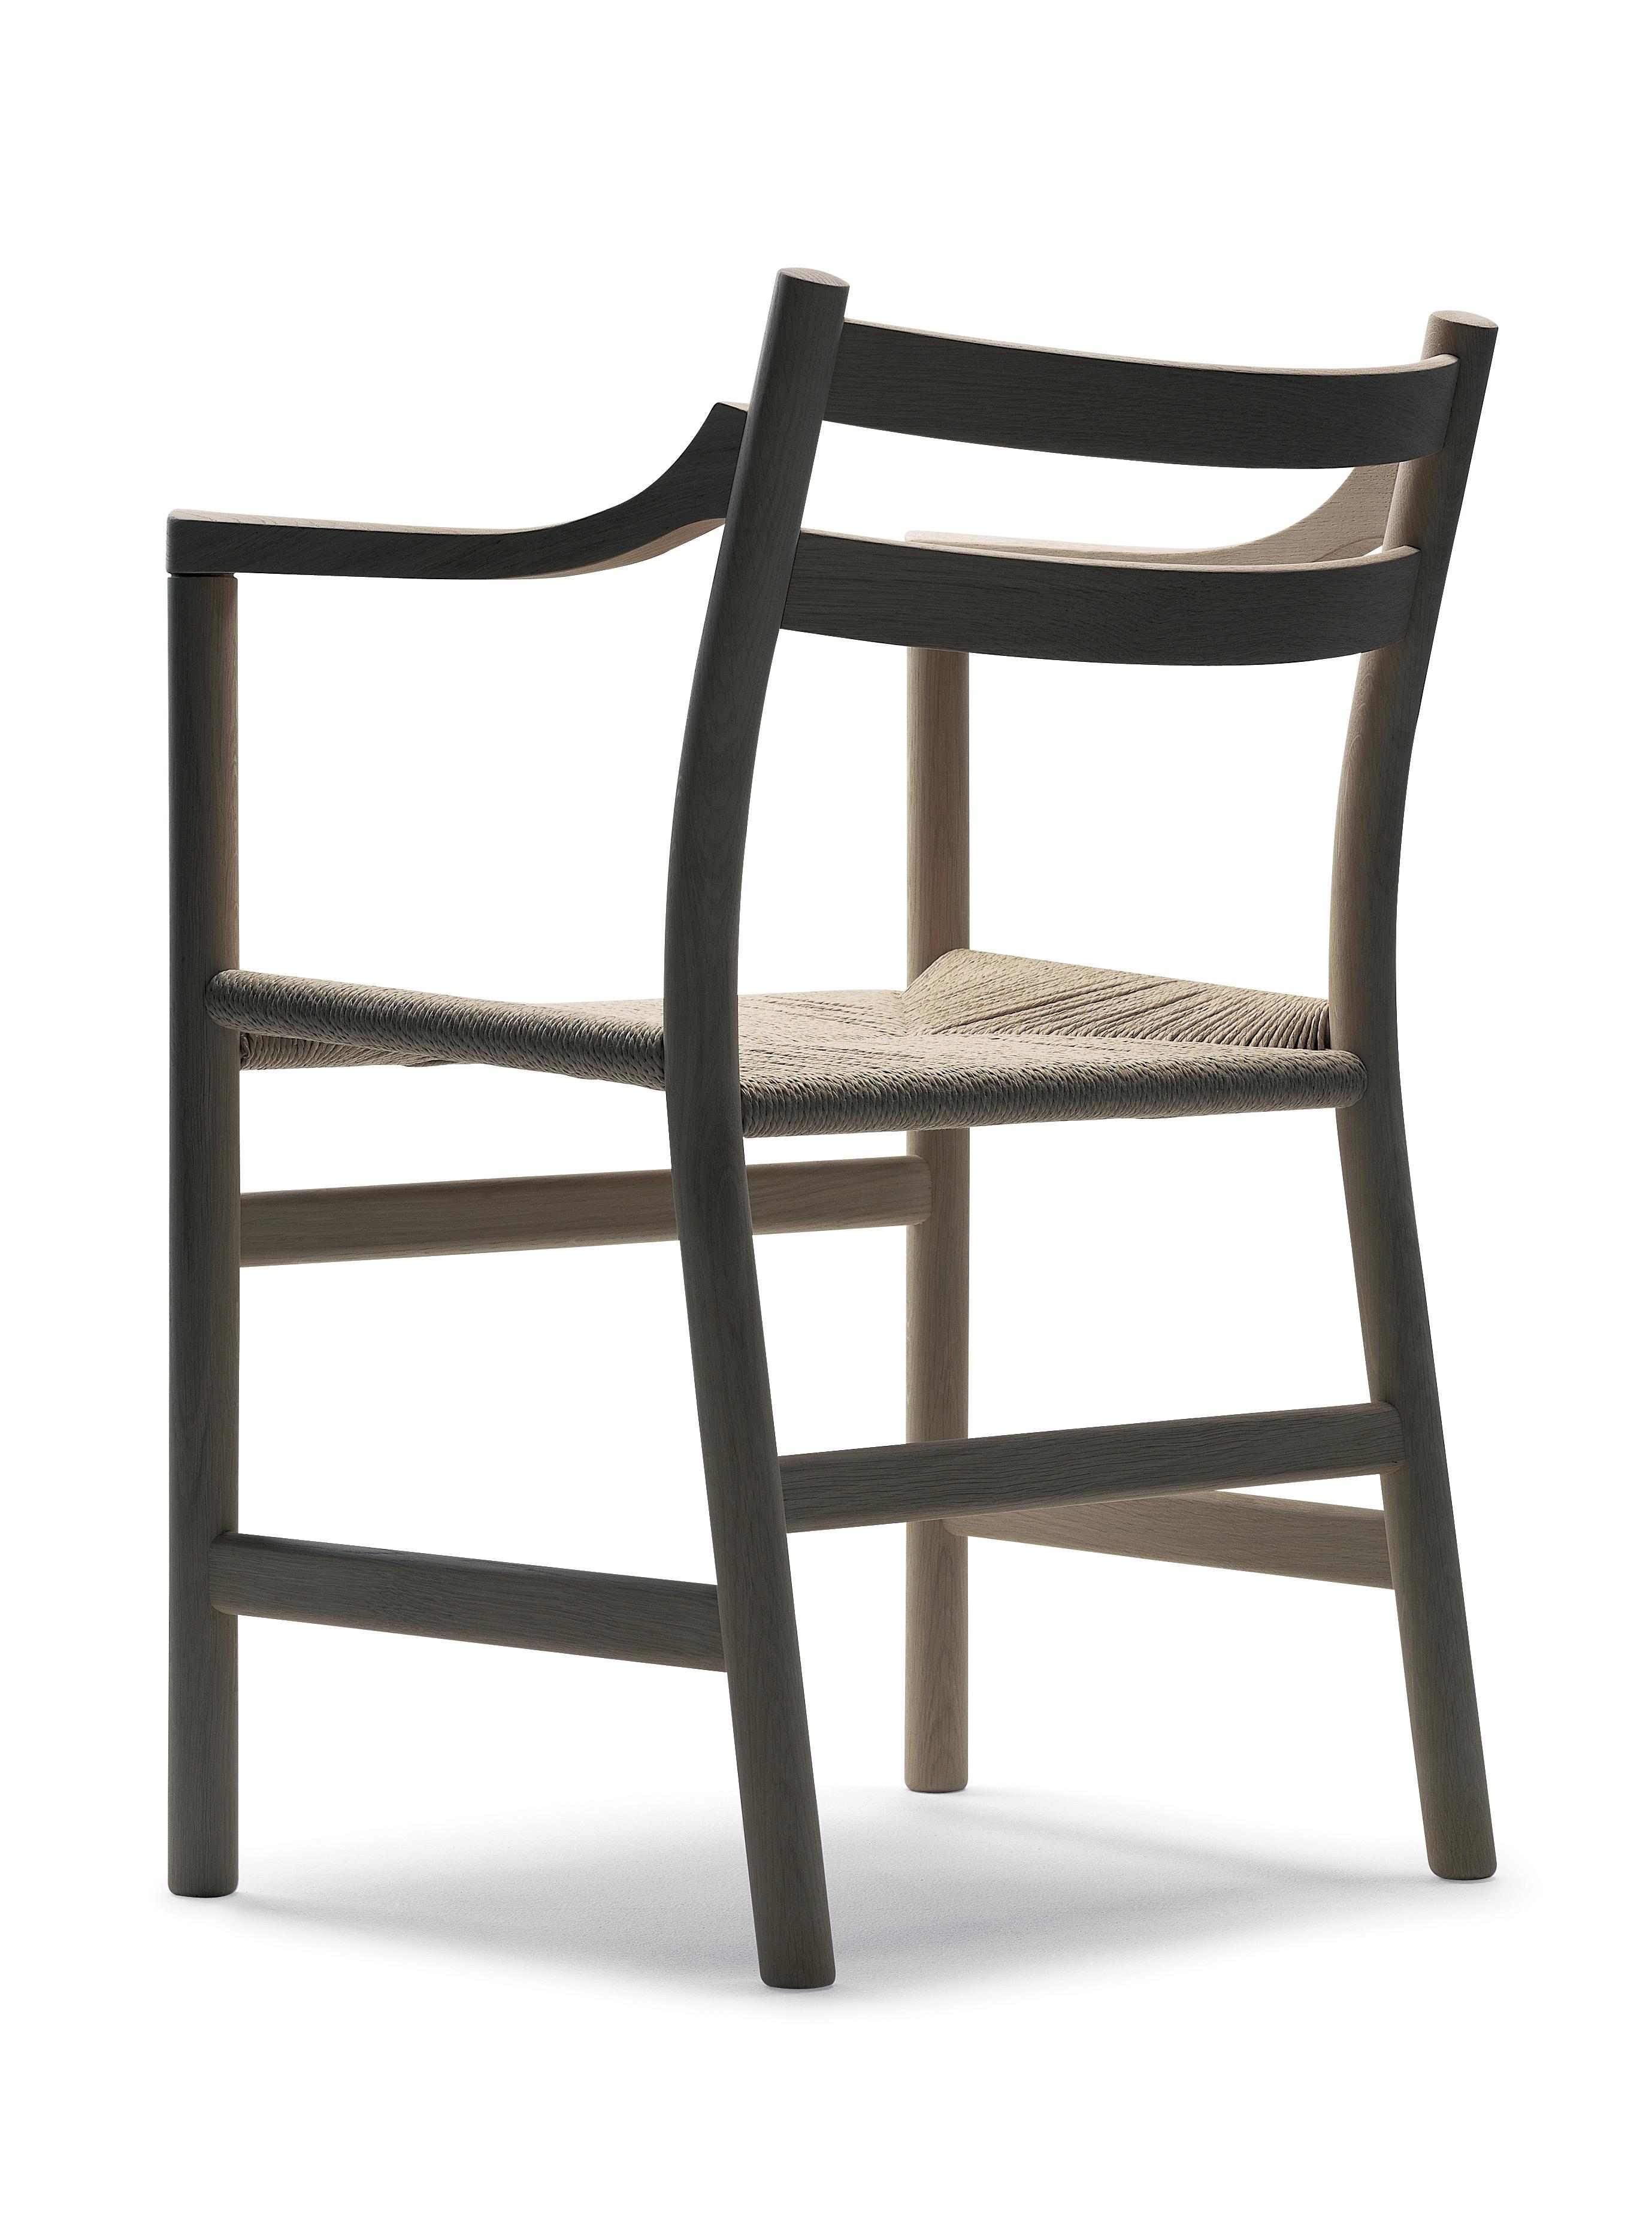 chaise ch46 et ch47 hans wegner carl hansen son. Black Bedroom Furniture Sets. Home Design Ideas